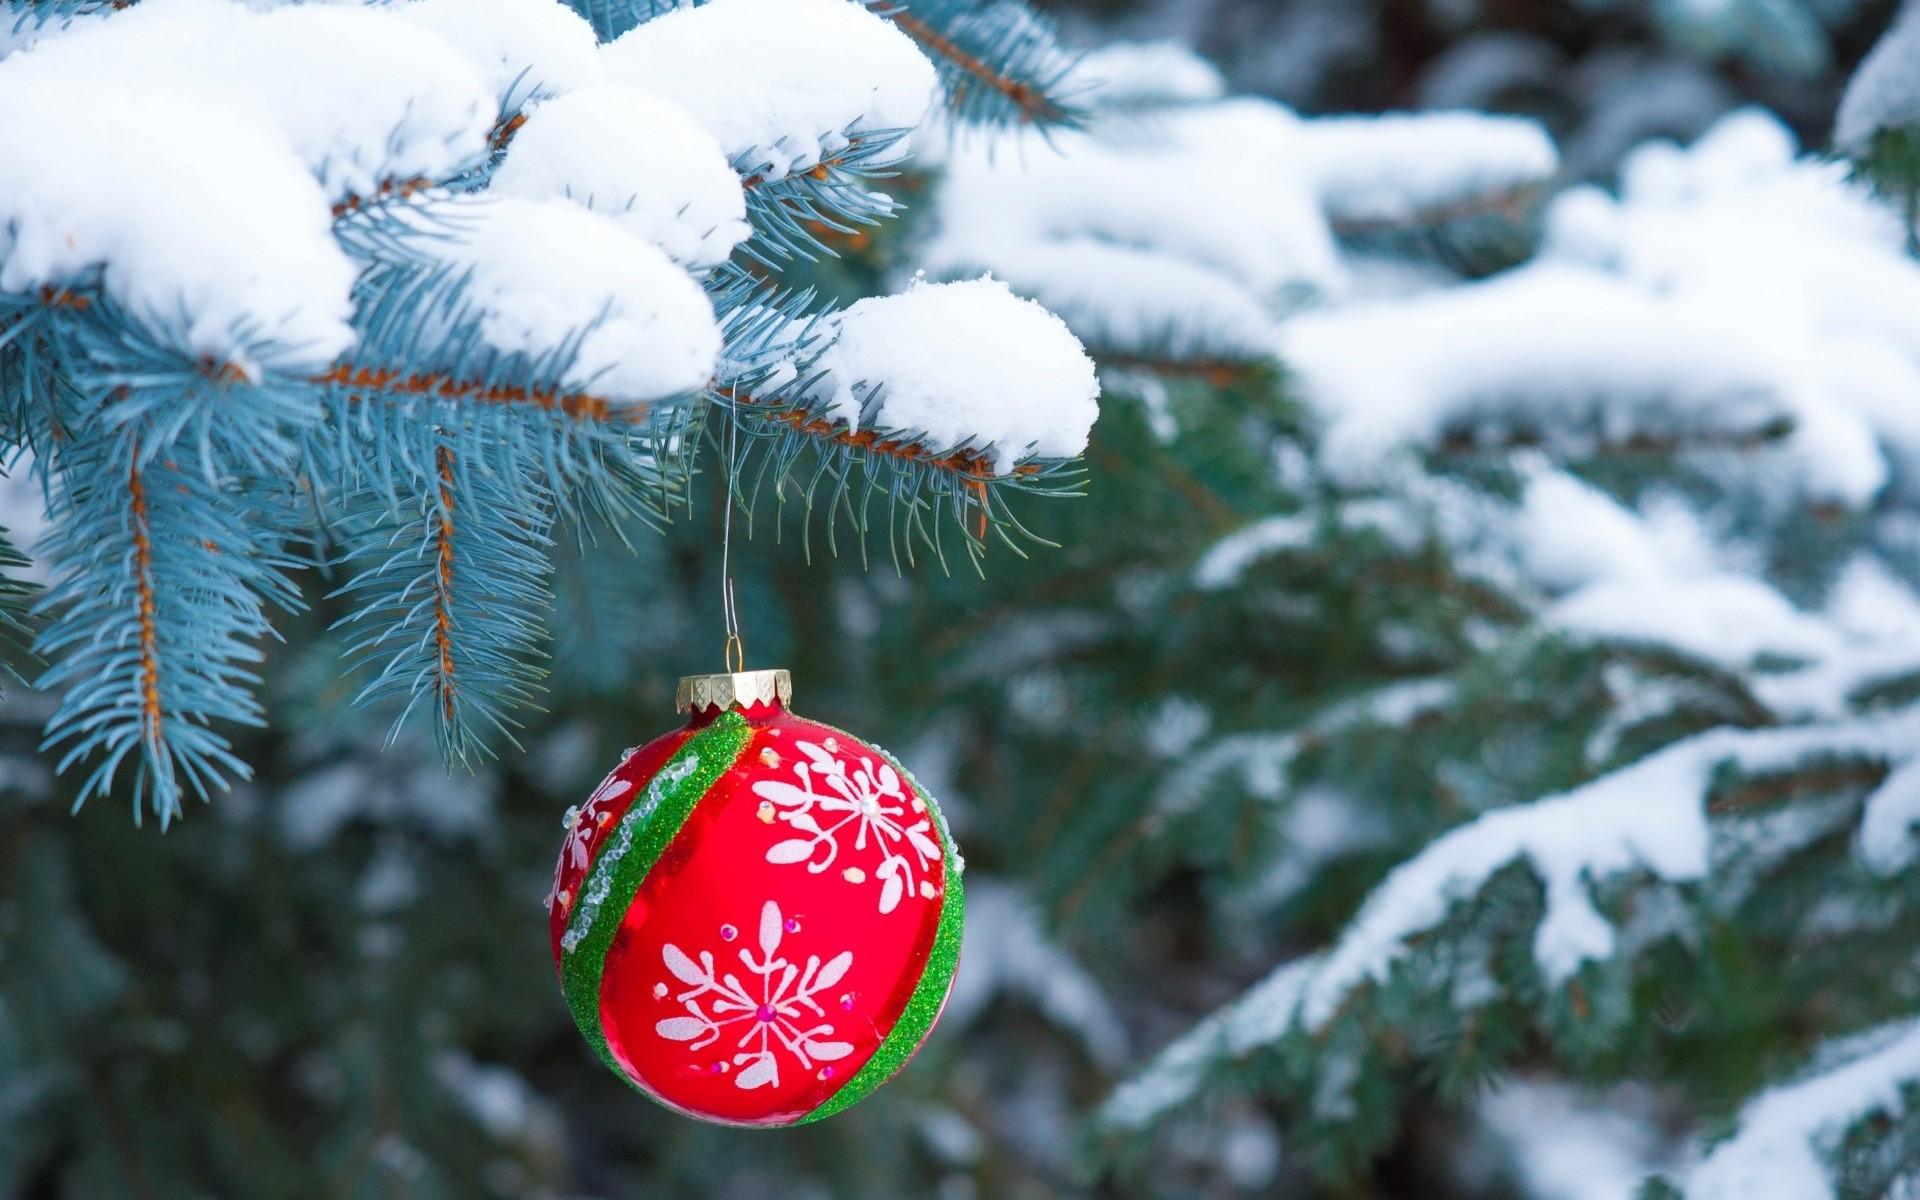 Wallpaper Snow Winter Branch Spruce Christmas Tree